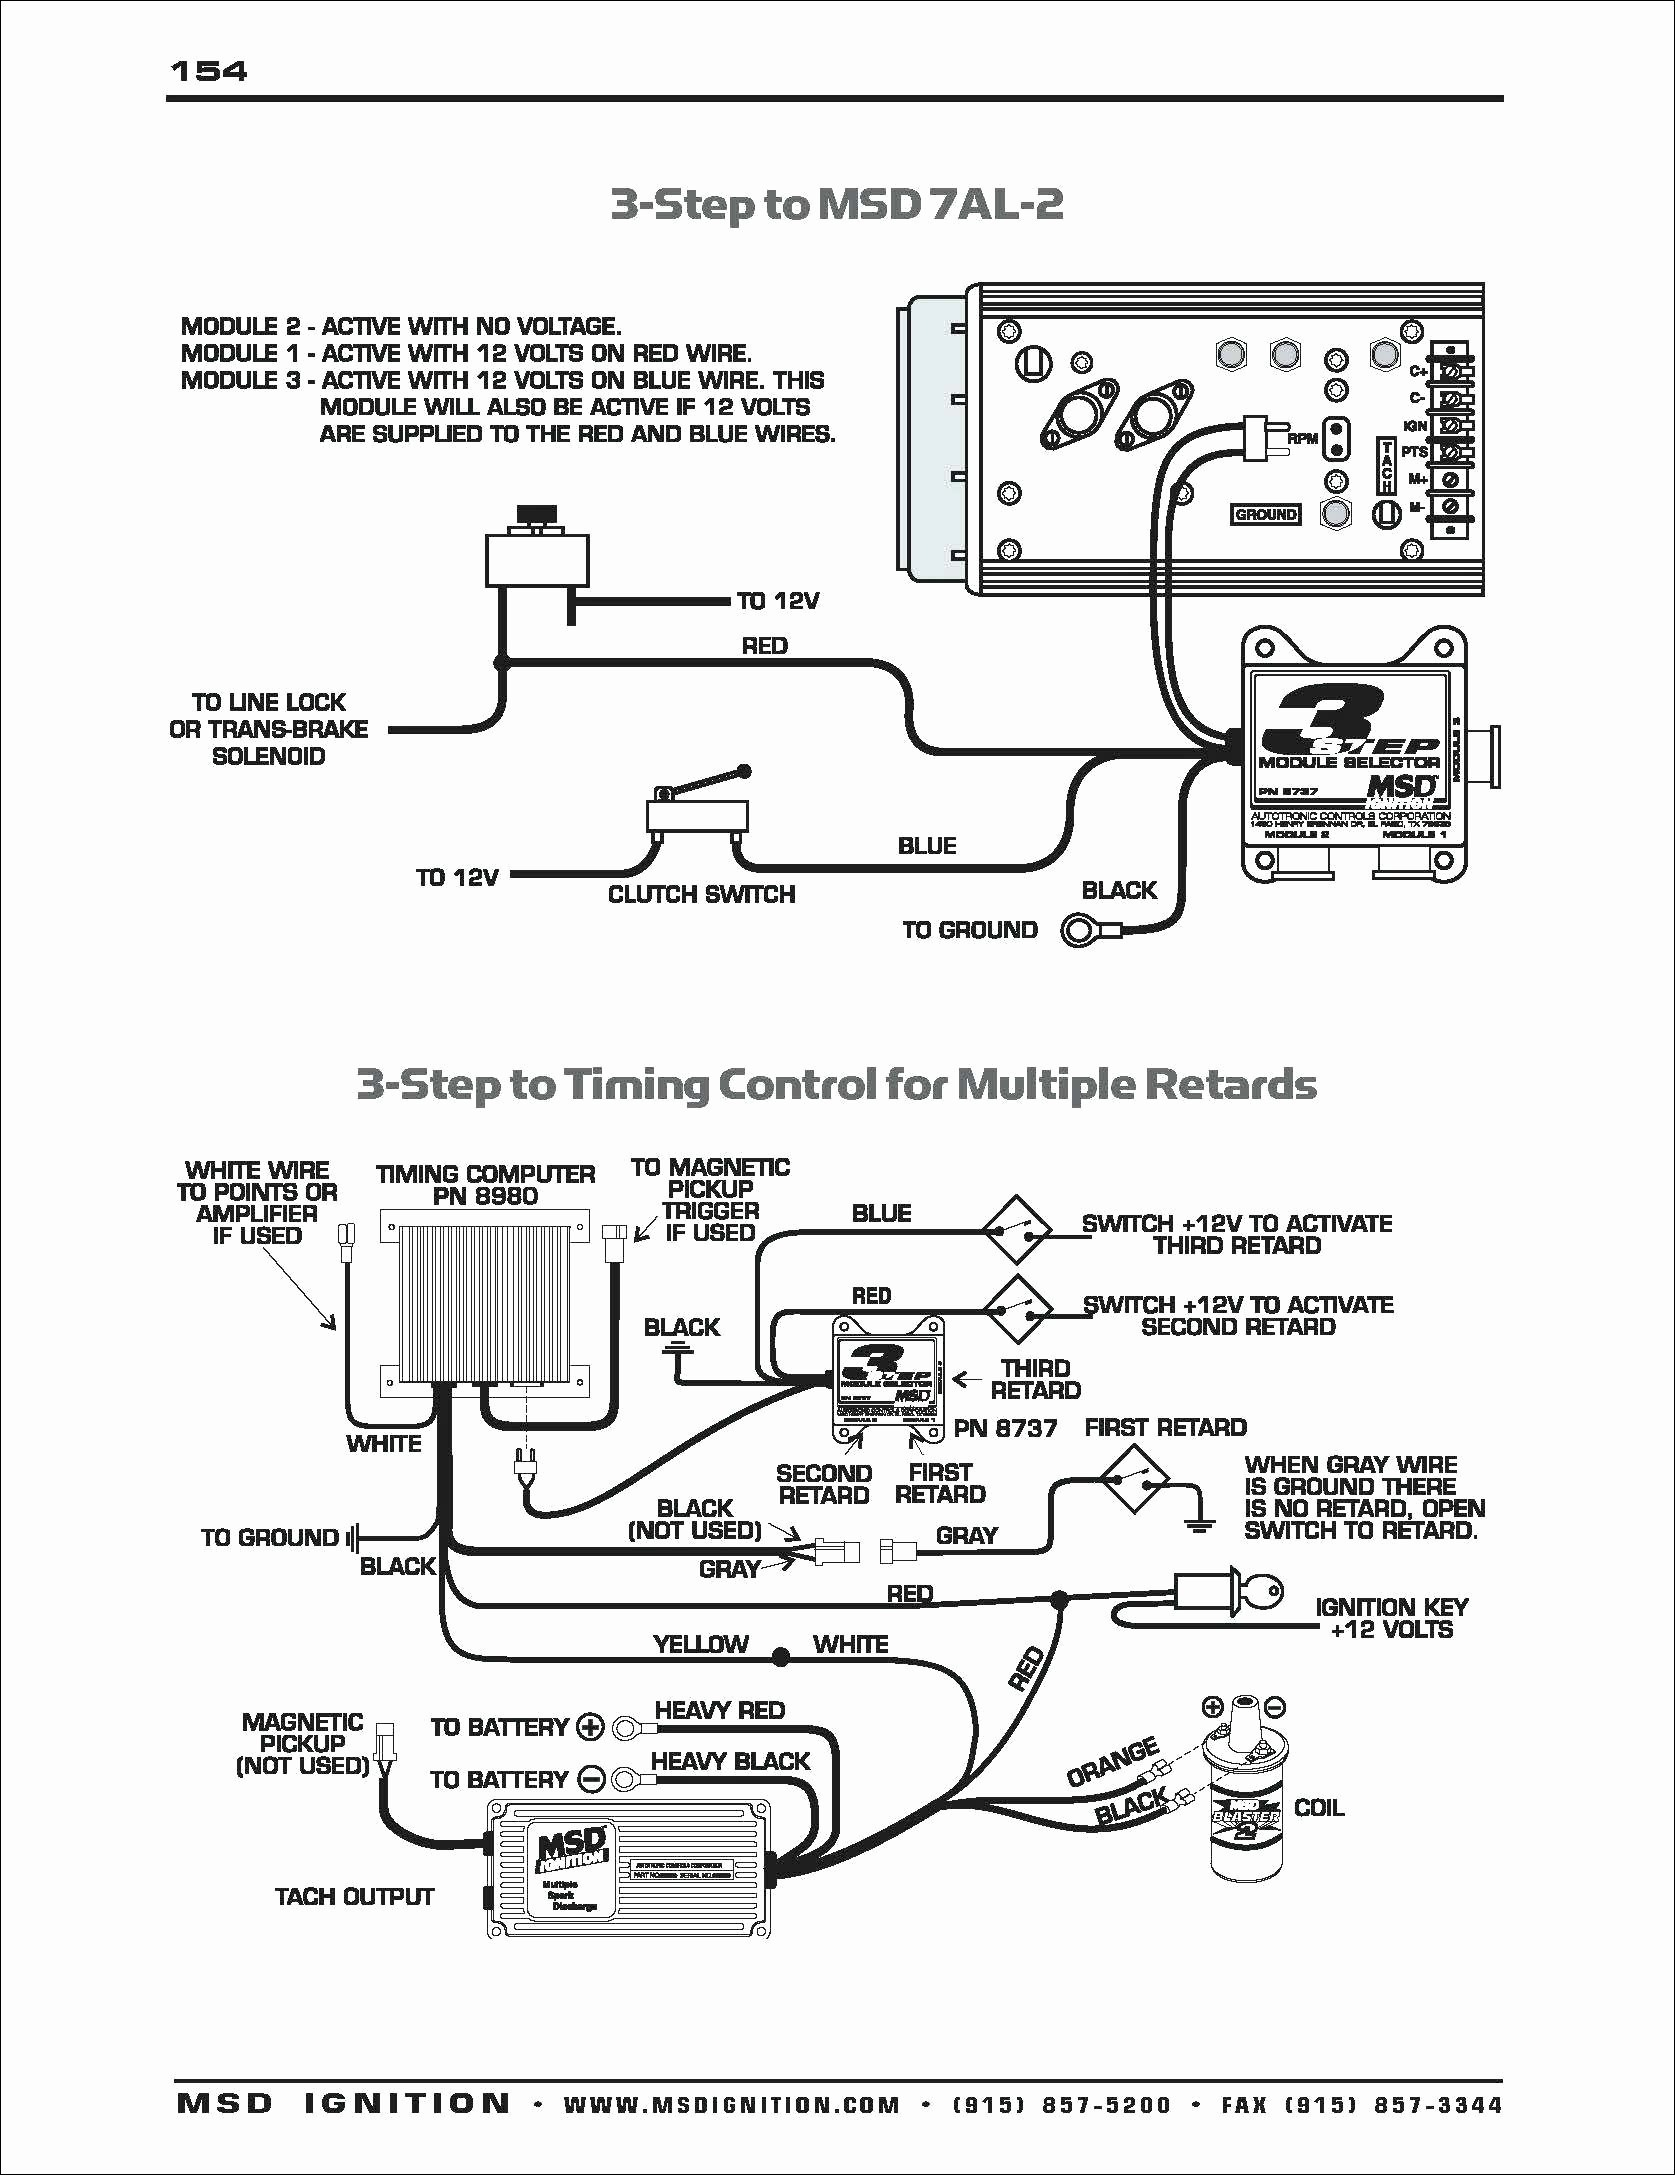 St81 solenoid Wiring Diagram atv Starter solenoid Wiring Diagram Wiring Diagram Schema Of St81 solenoid Wiring Diagram